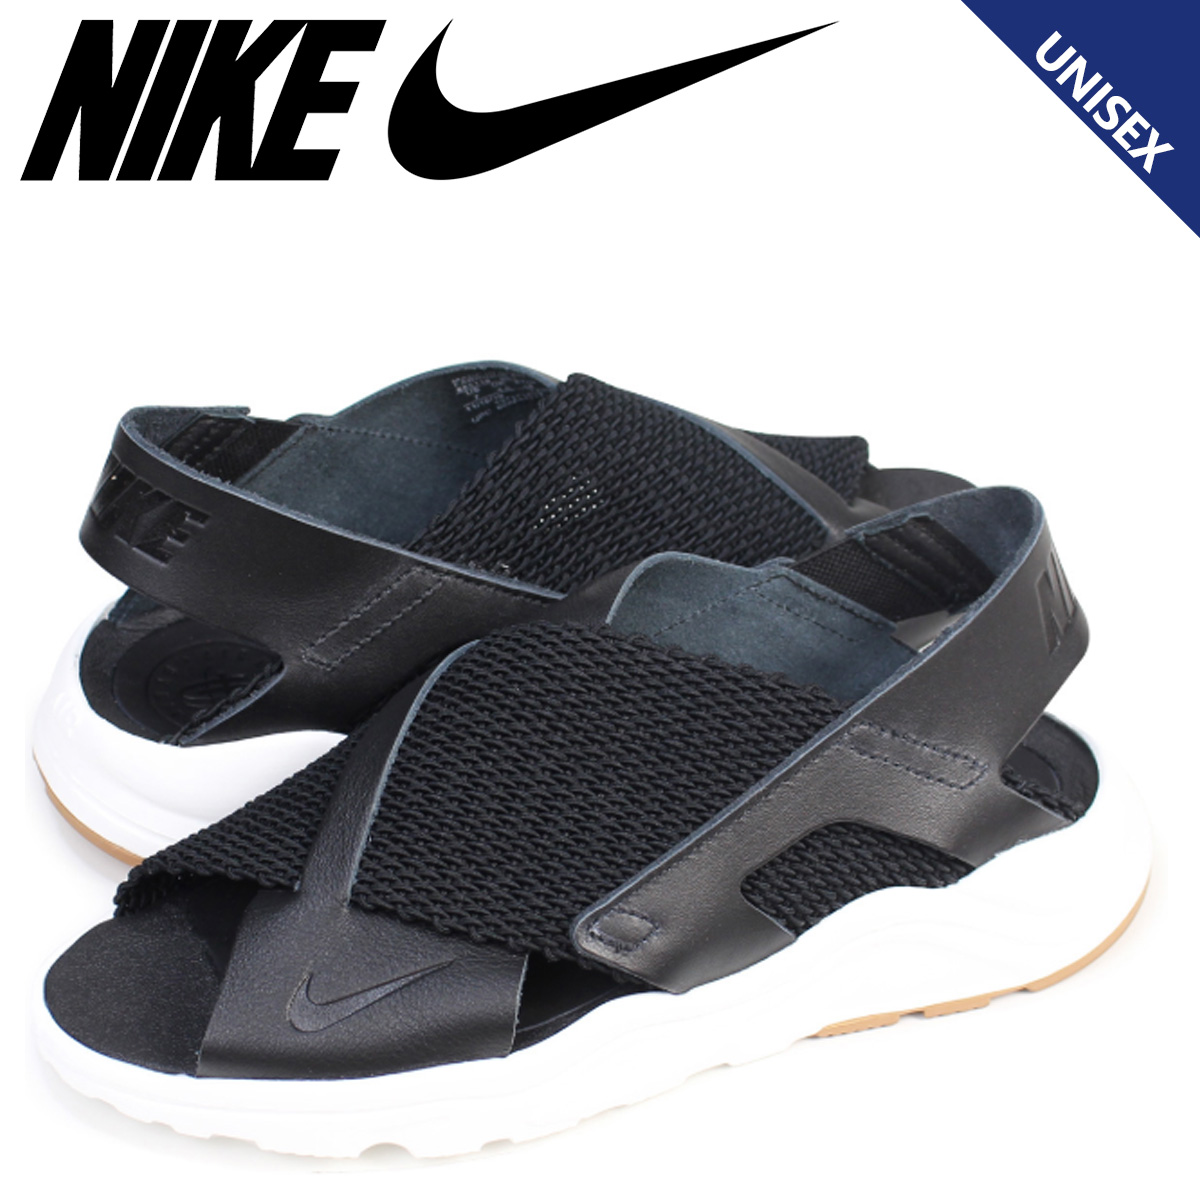 the best how to buy get new Nike NIKE エアハラチウルトラサンダル W AIR HUARACHE ULTRA Lady's men black black  885,118-001 [196]